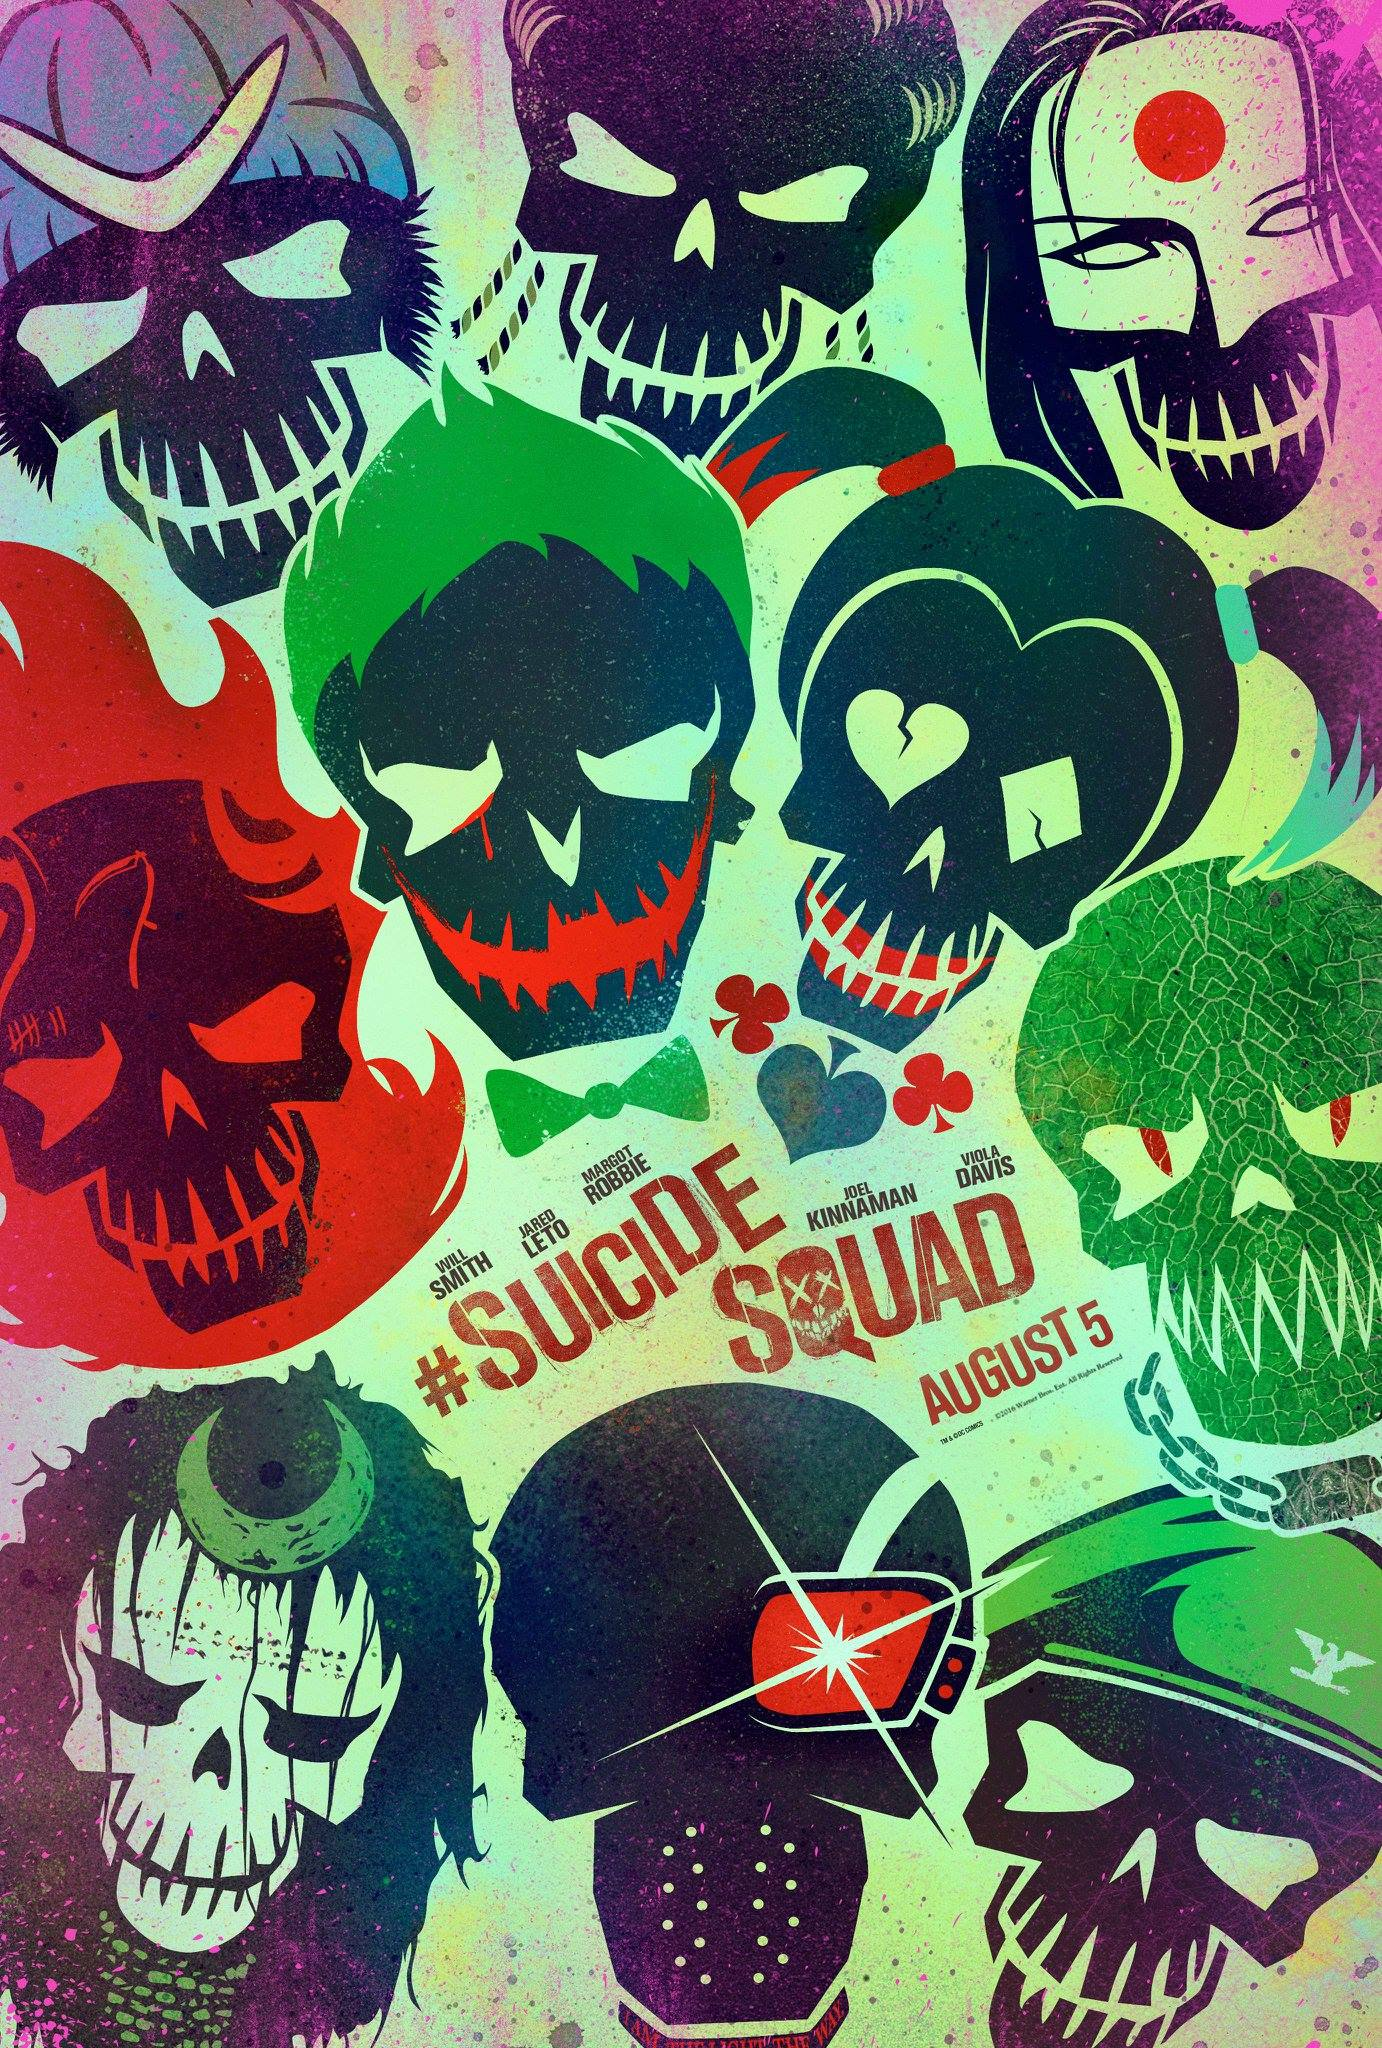 suicide squad wallpaper  Joker Suicide Squad Wallpapers - Wallpaper Cave